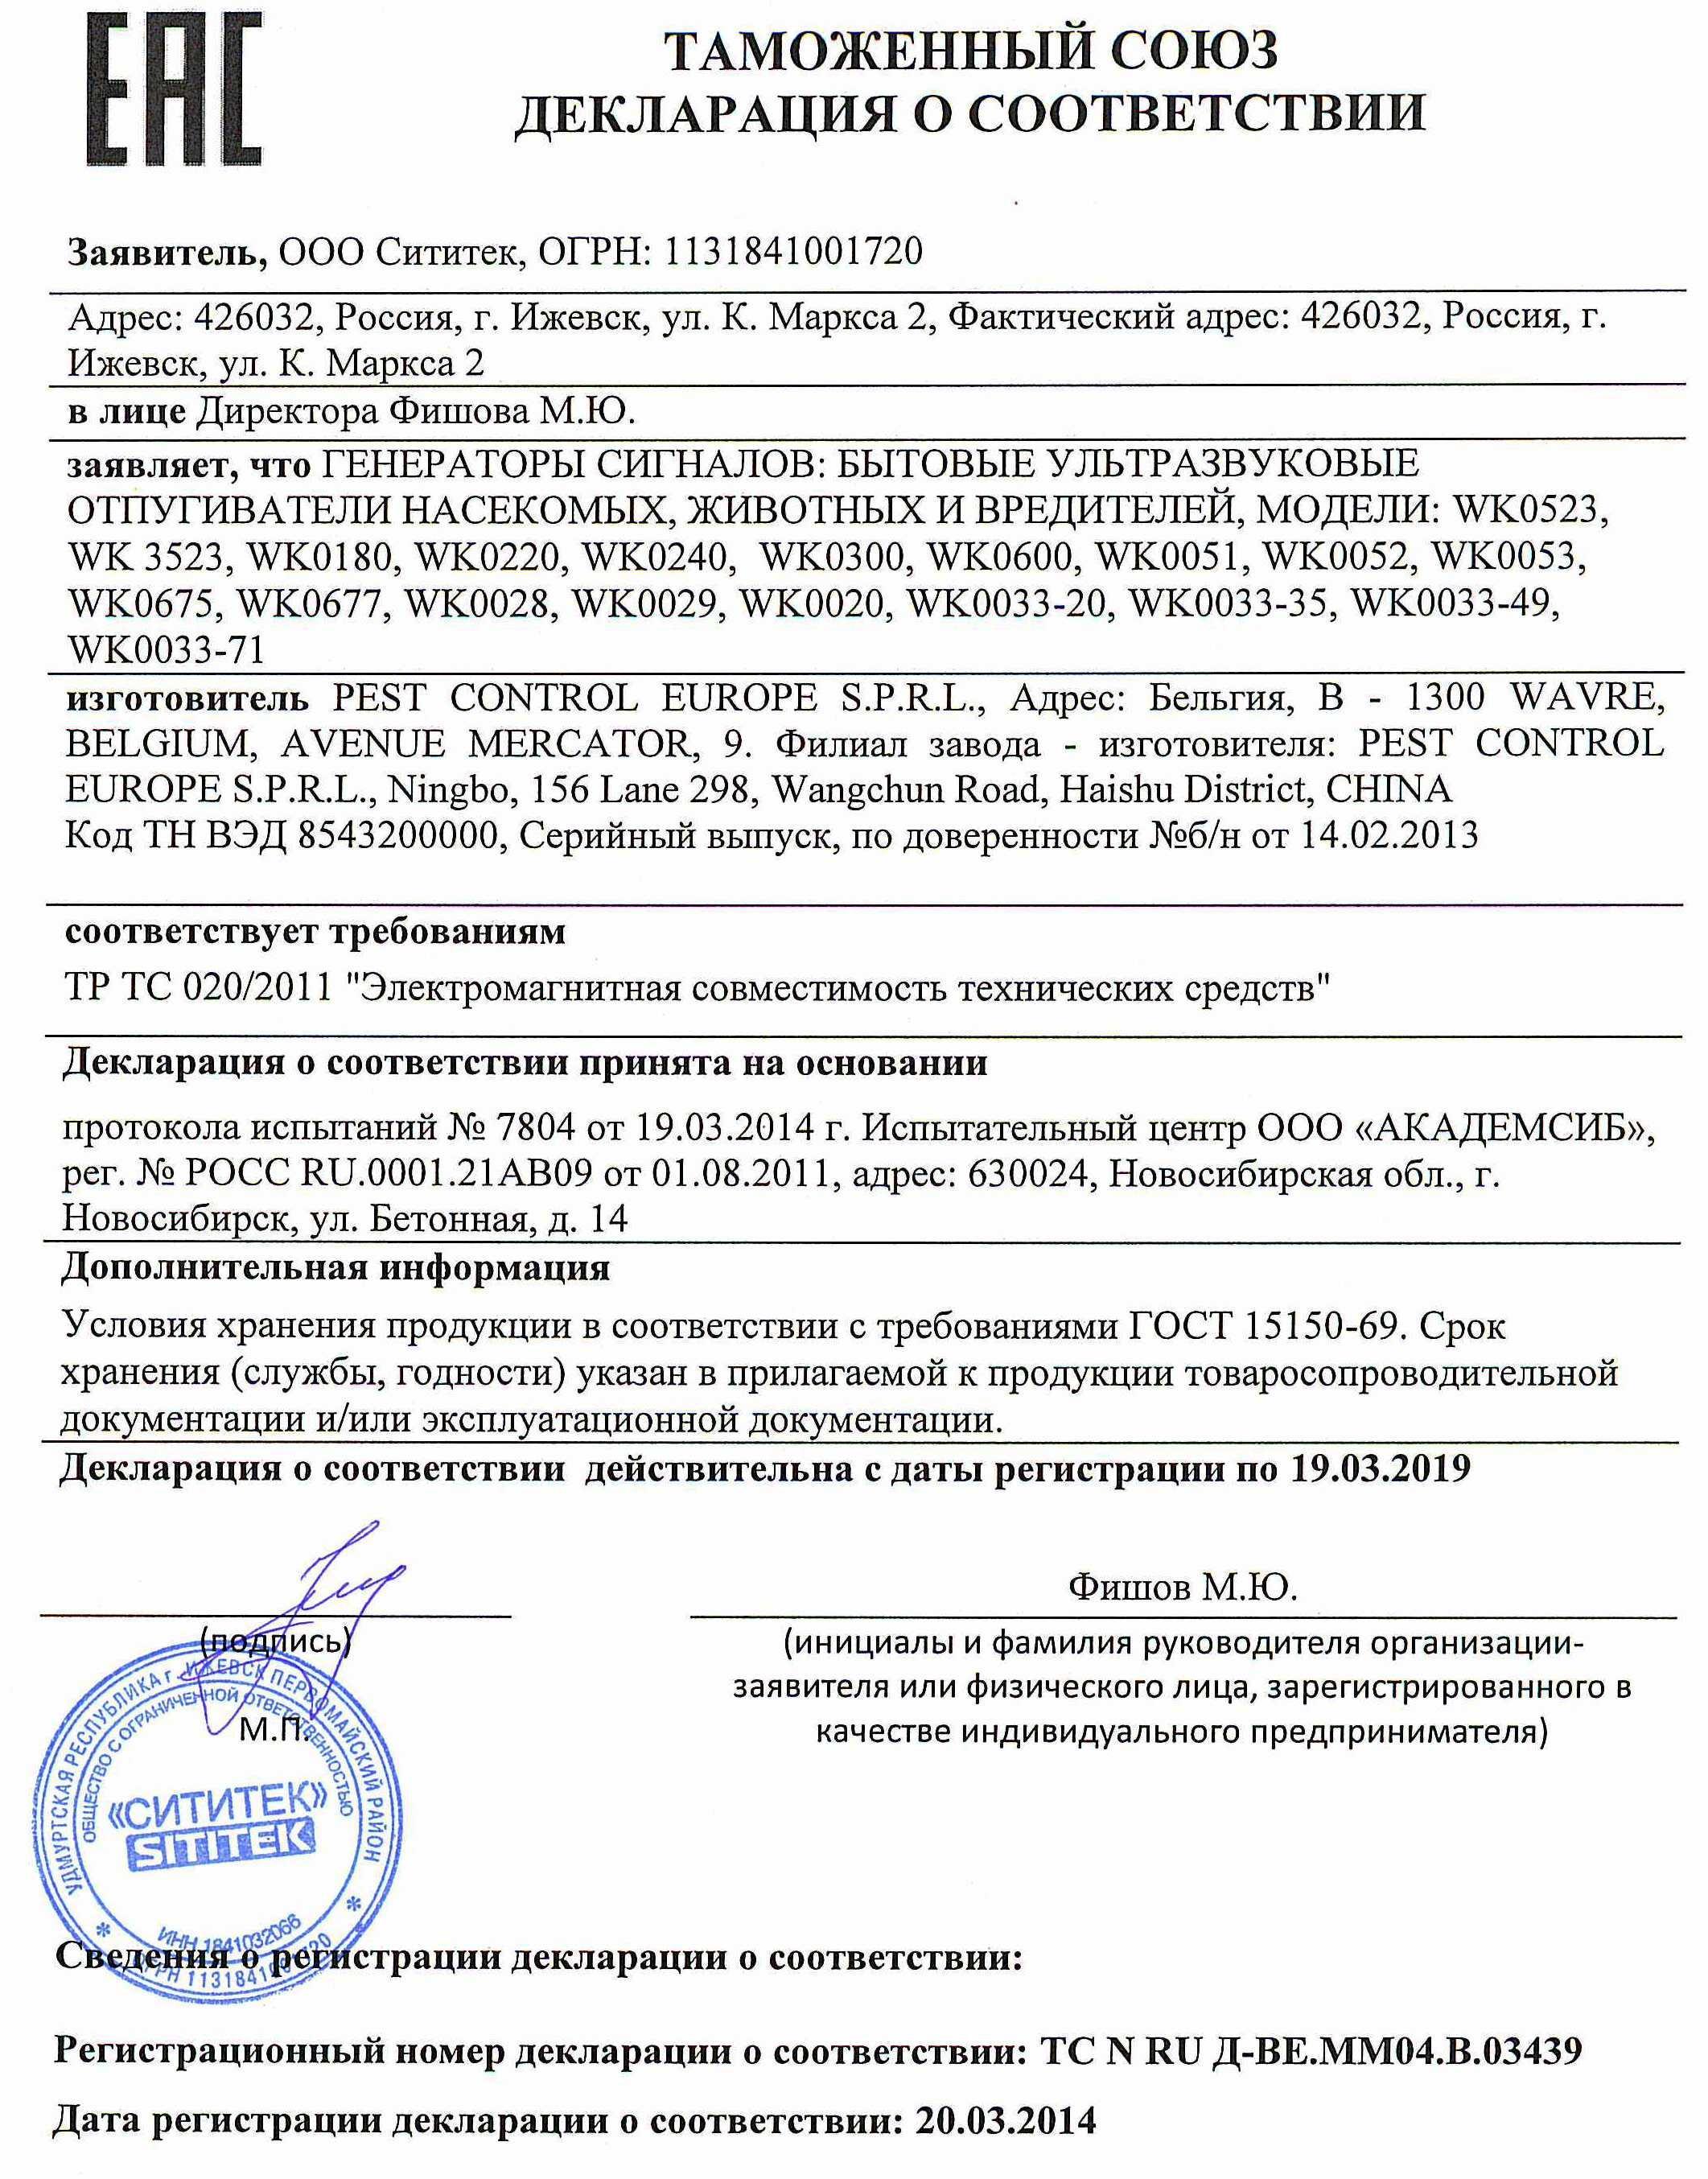 https://antigryzun.ru/images/upload/WEITECH_deklar_sootvet_TS1.jpg